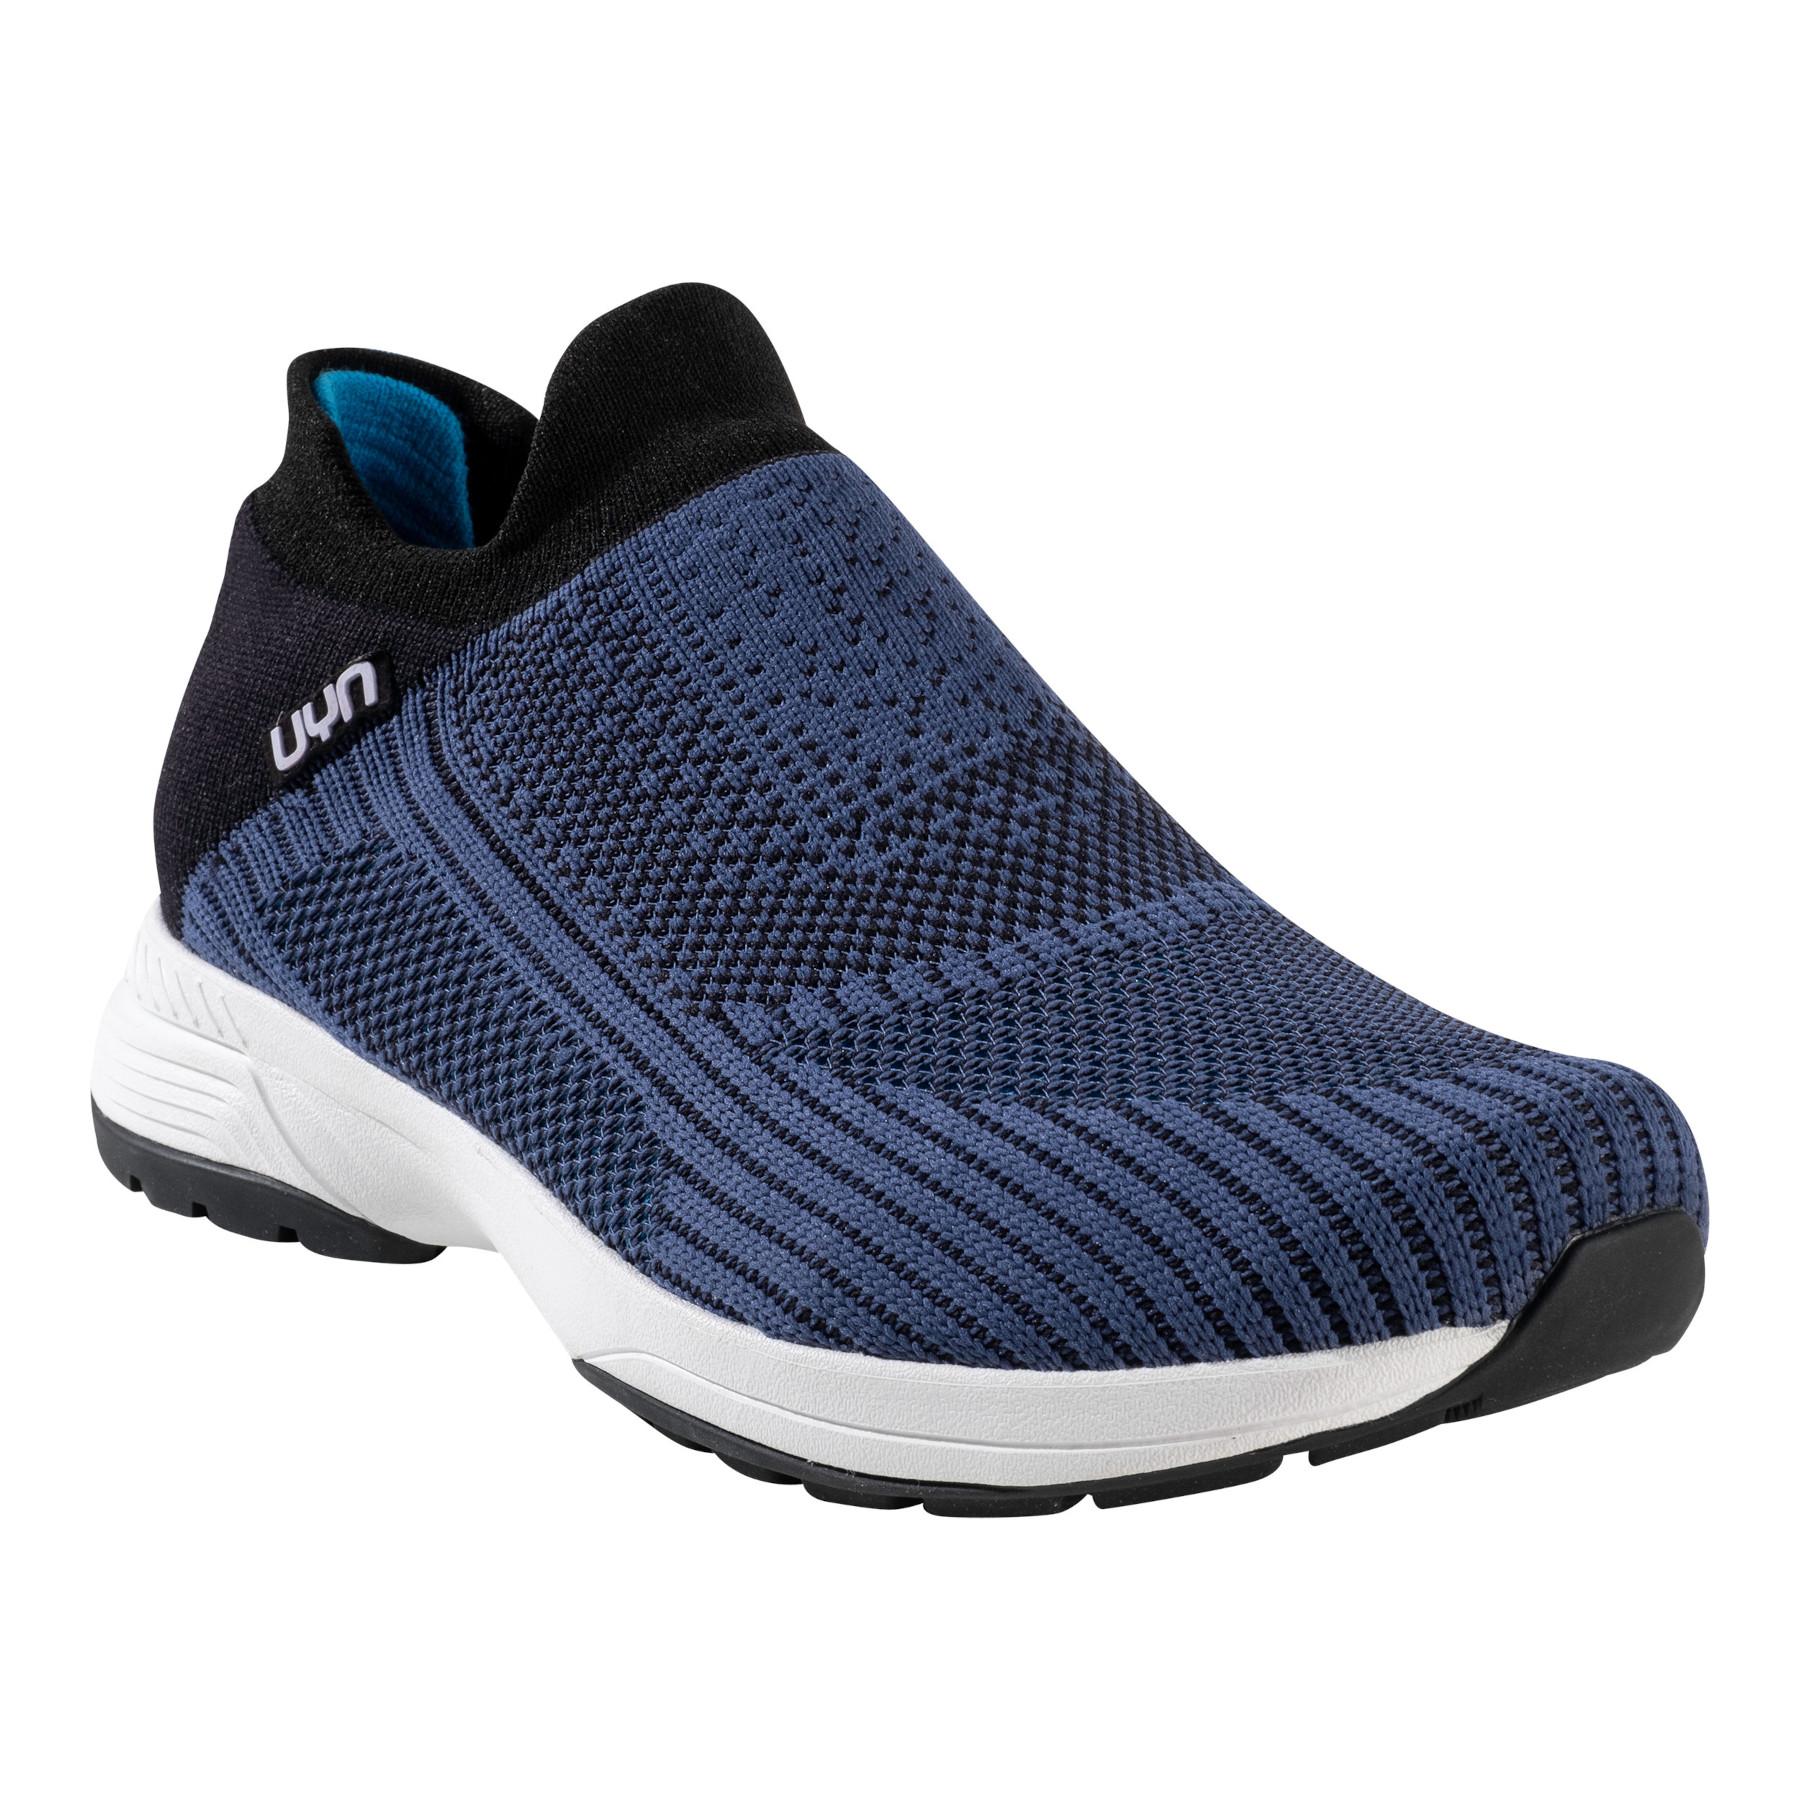 UYN Free Flow Grade Man Running Shoes - Blue/Black